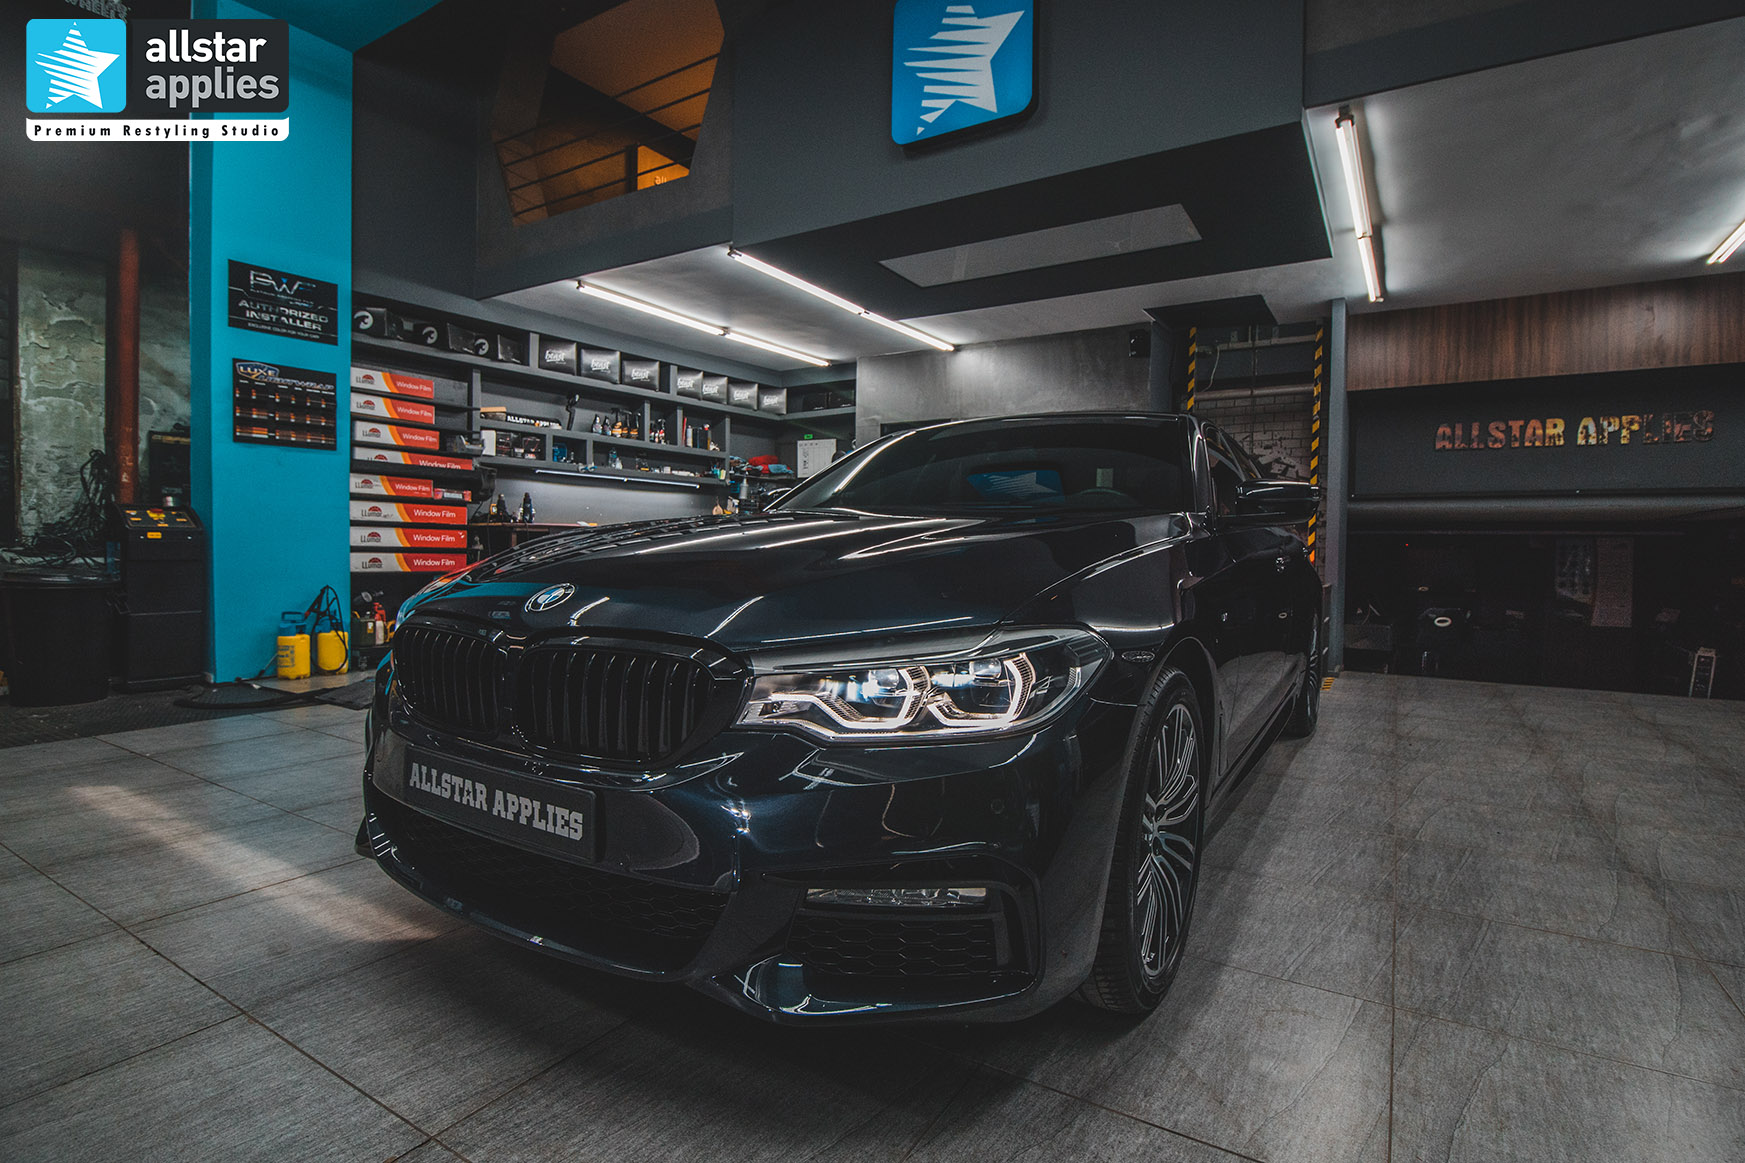 BMW G30 5 SERIES M ALLSTAR APPLIES PPF 5